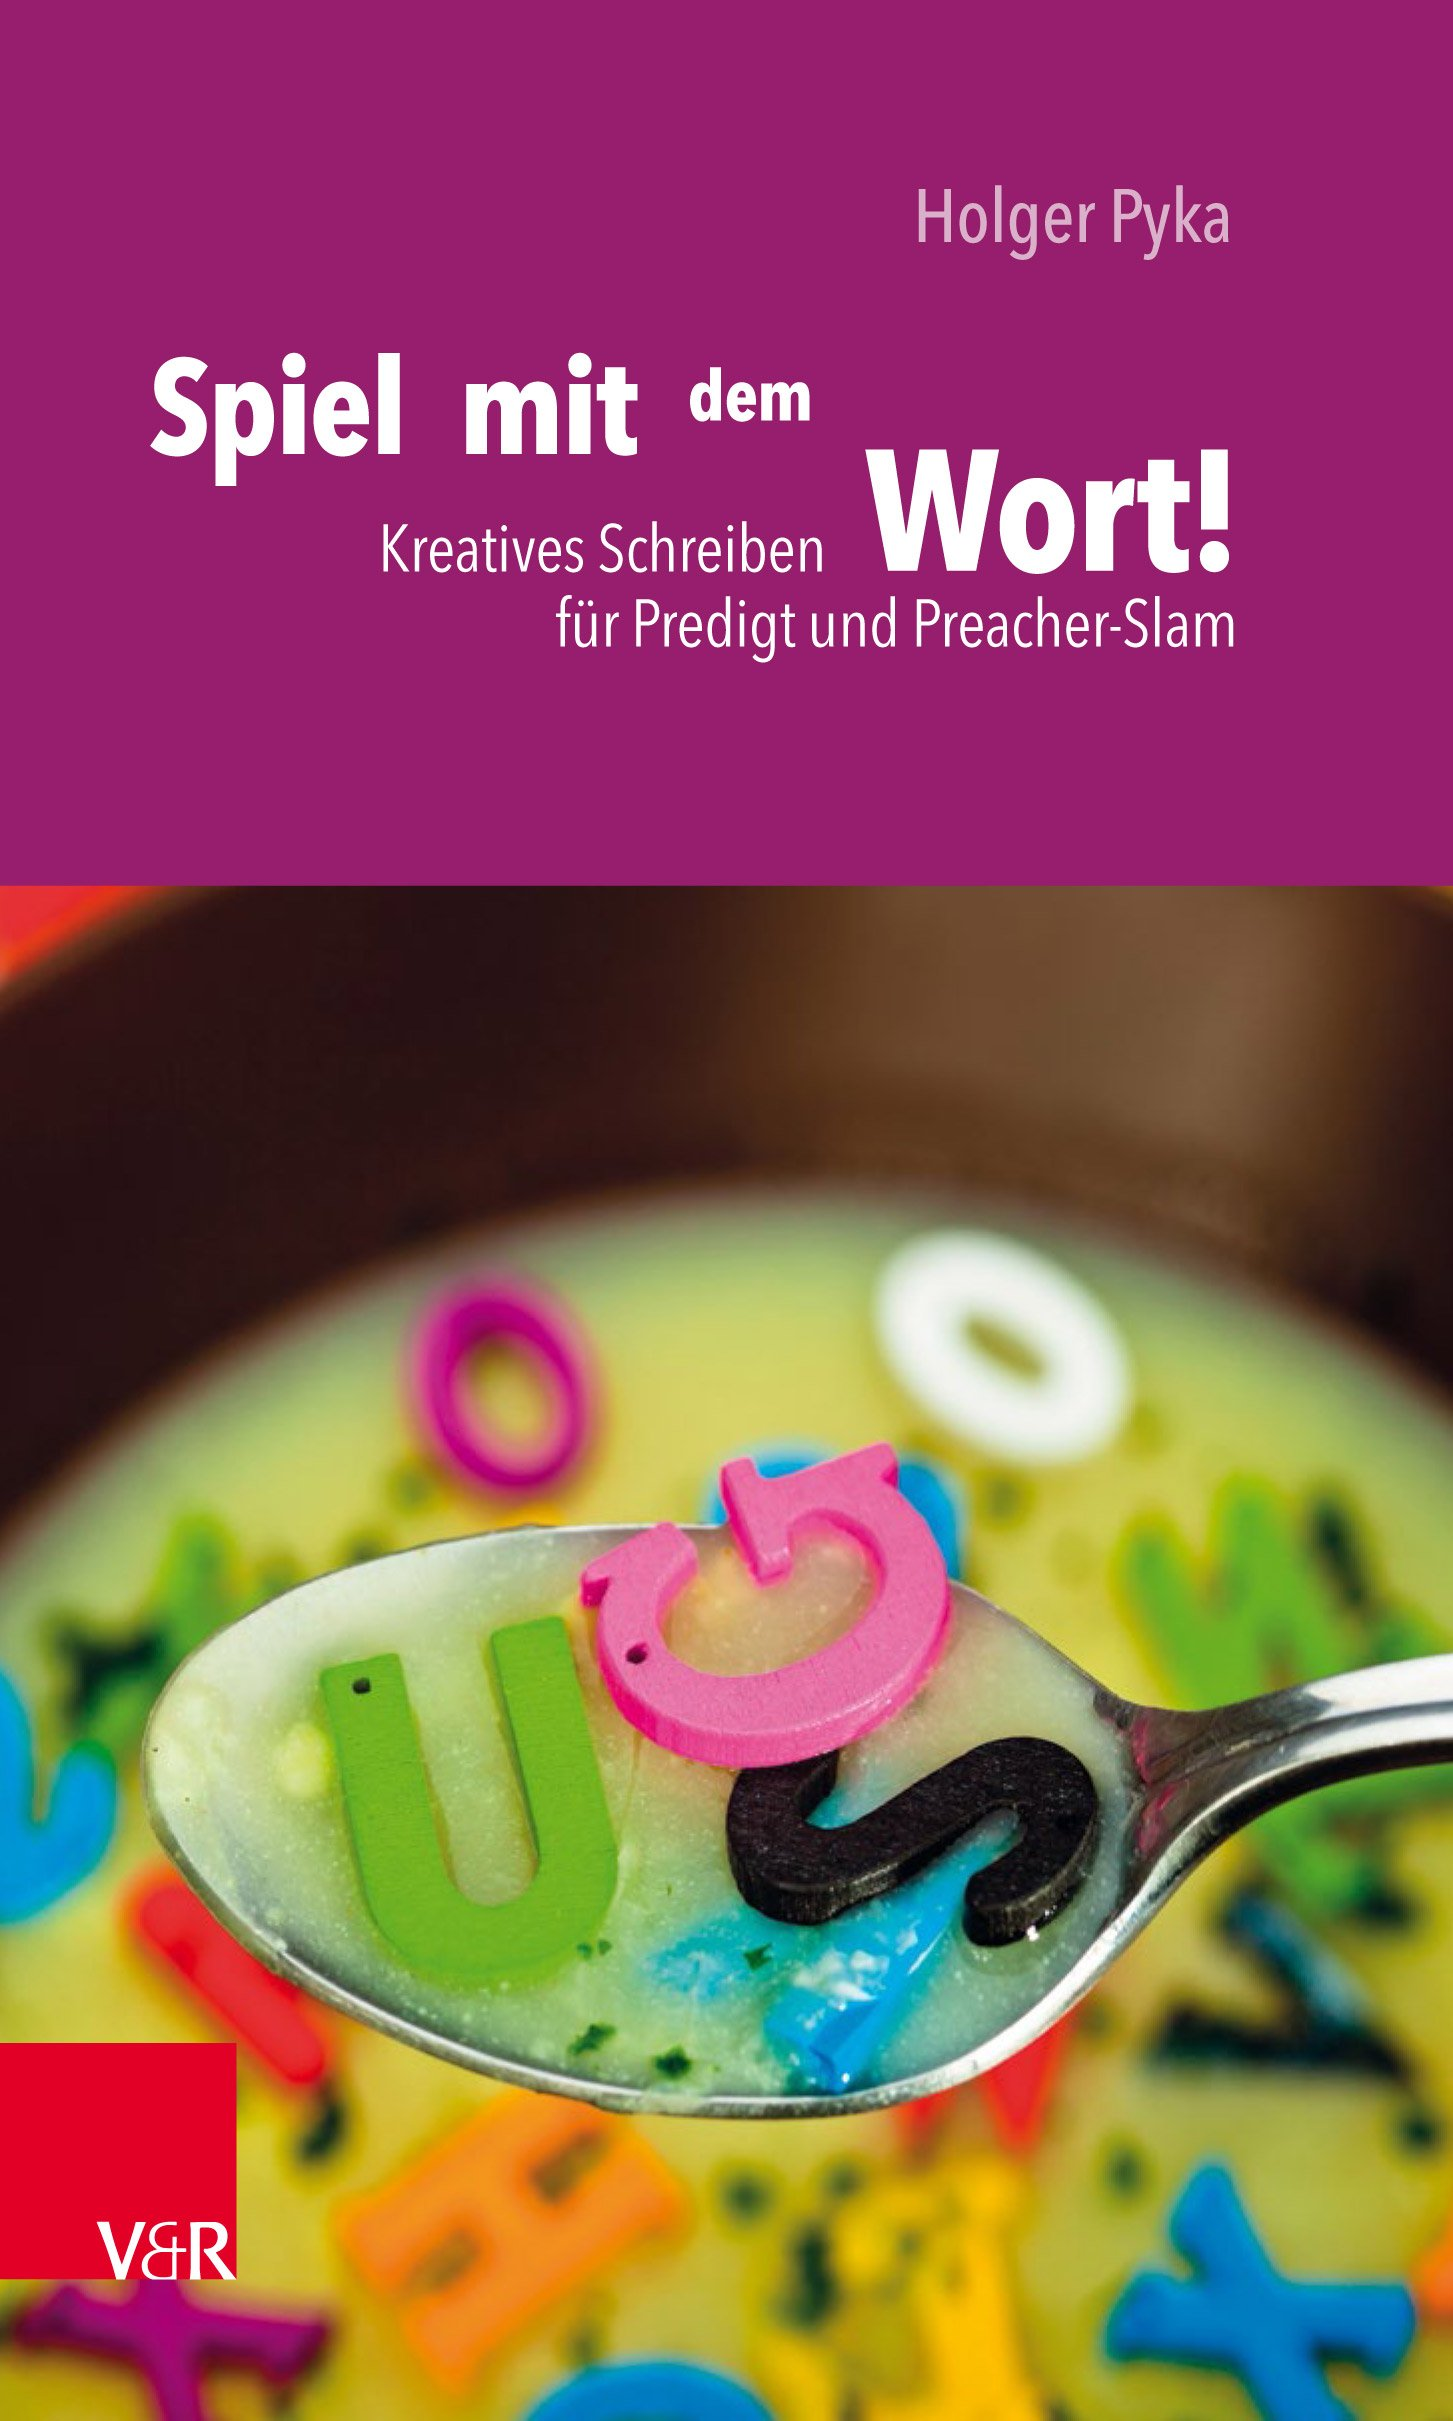 Kreatives Schreiben – homilia.de